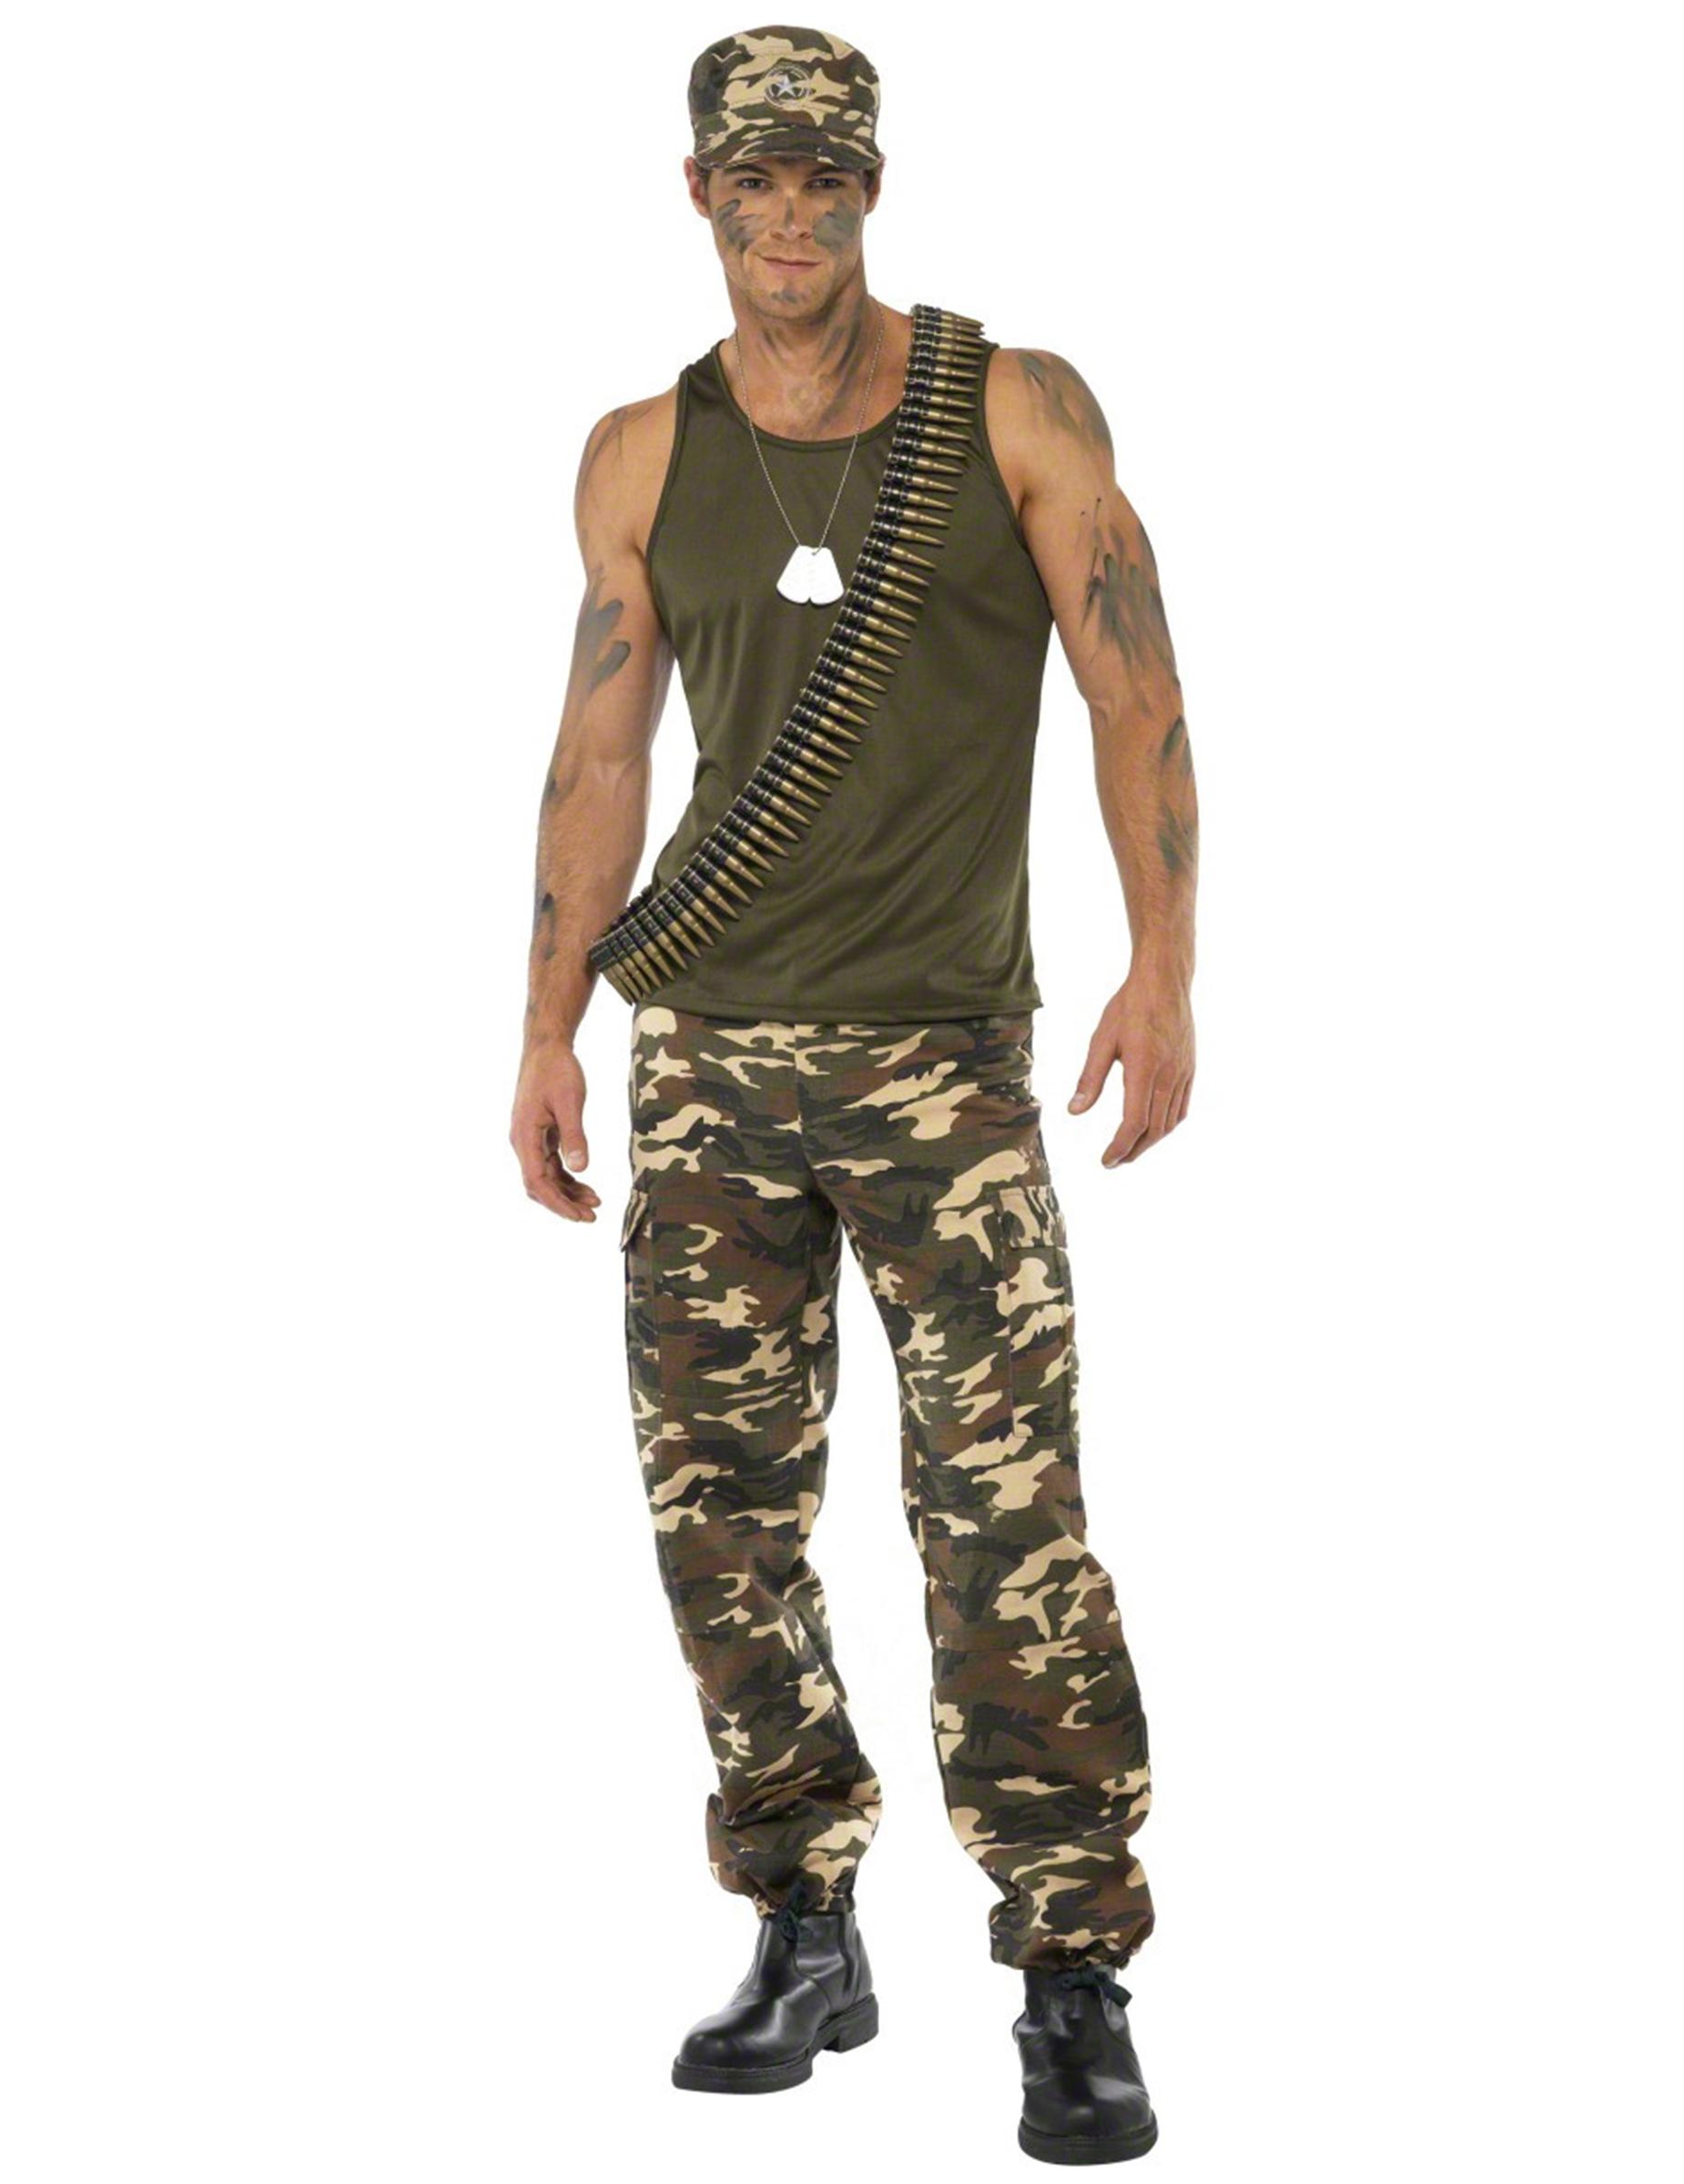 soldaten kost m f r herren kost me f r erwachsene und g nstige faschingskost me vegaoo. Black Bedroom Furniture Sets. Home Design Ideas